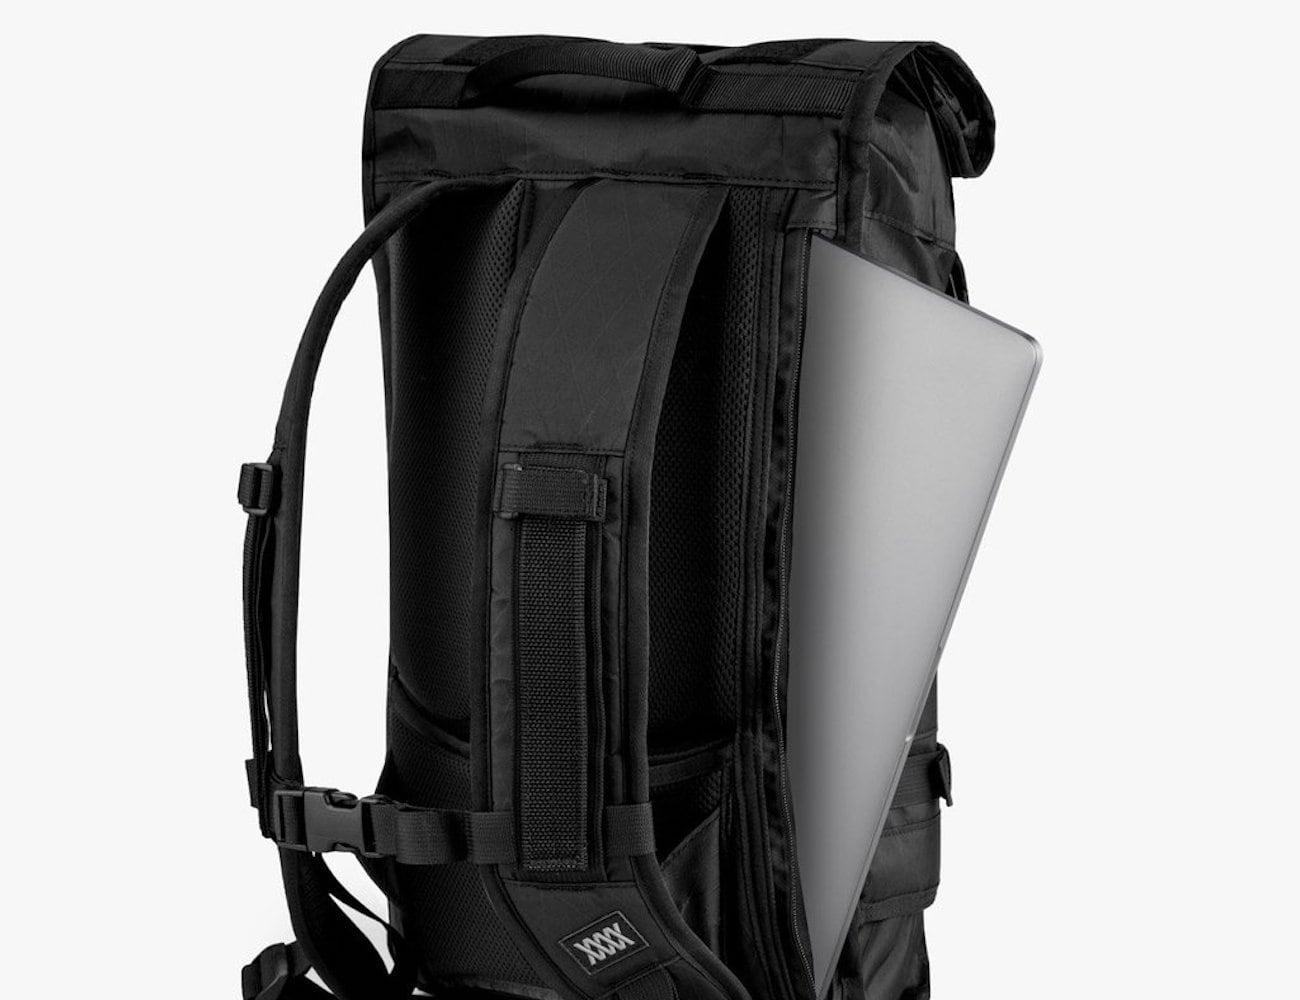 Mission Workshop Rhake Weatherproof Laptop Backpack » Gadget Flow fe341e1b1da28